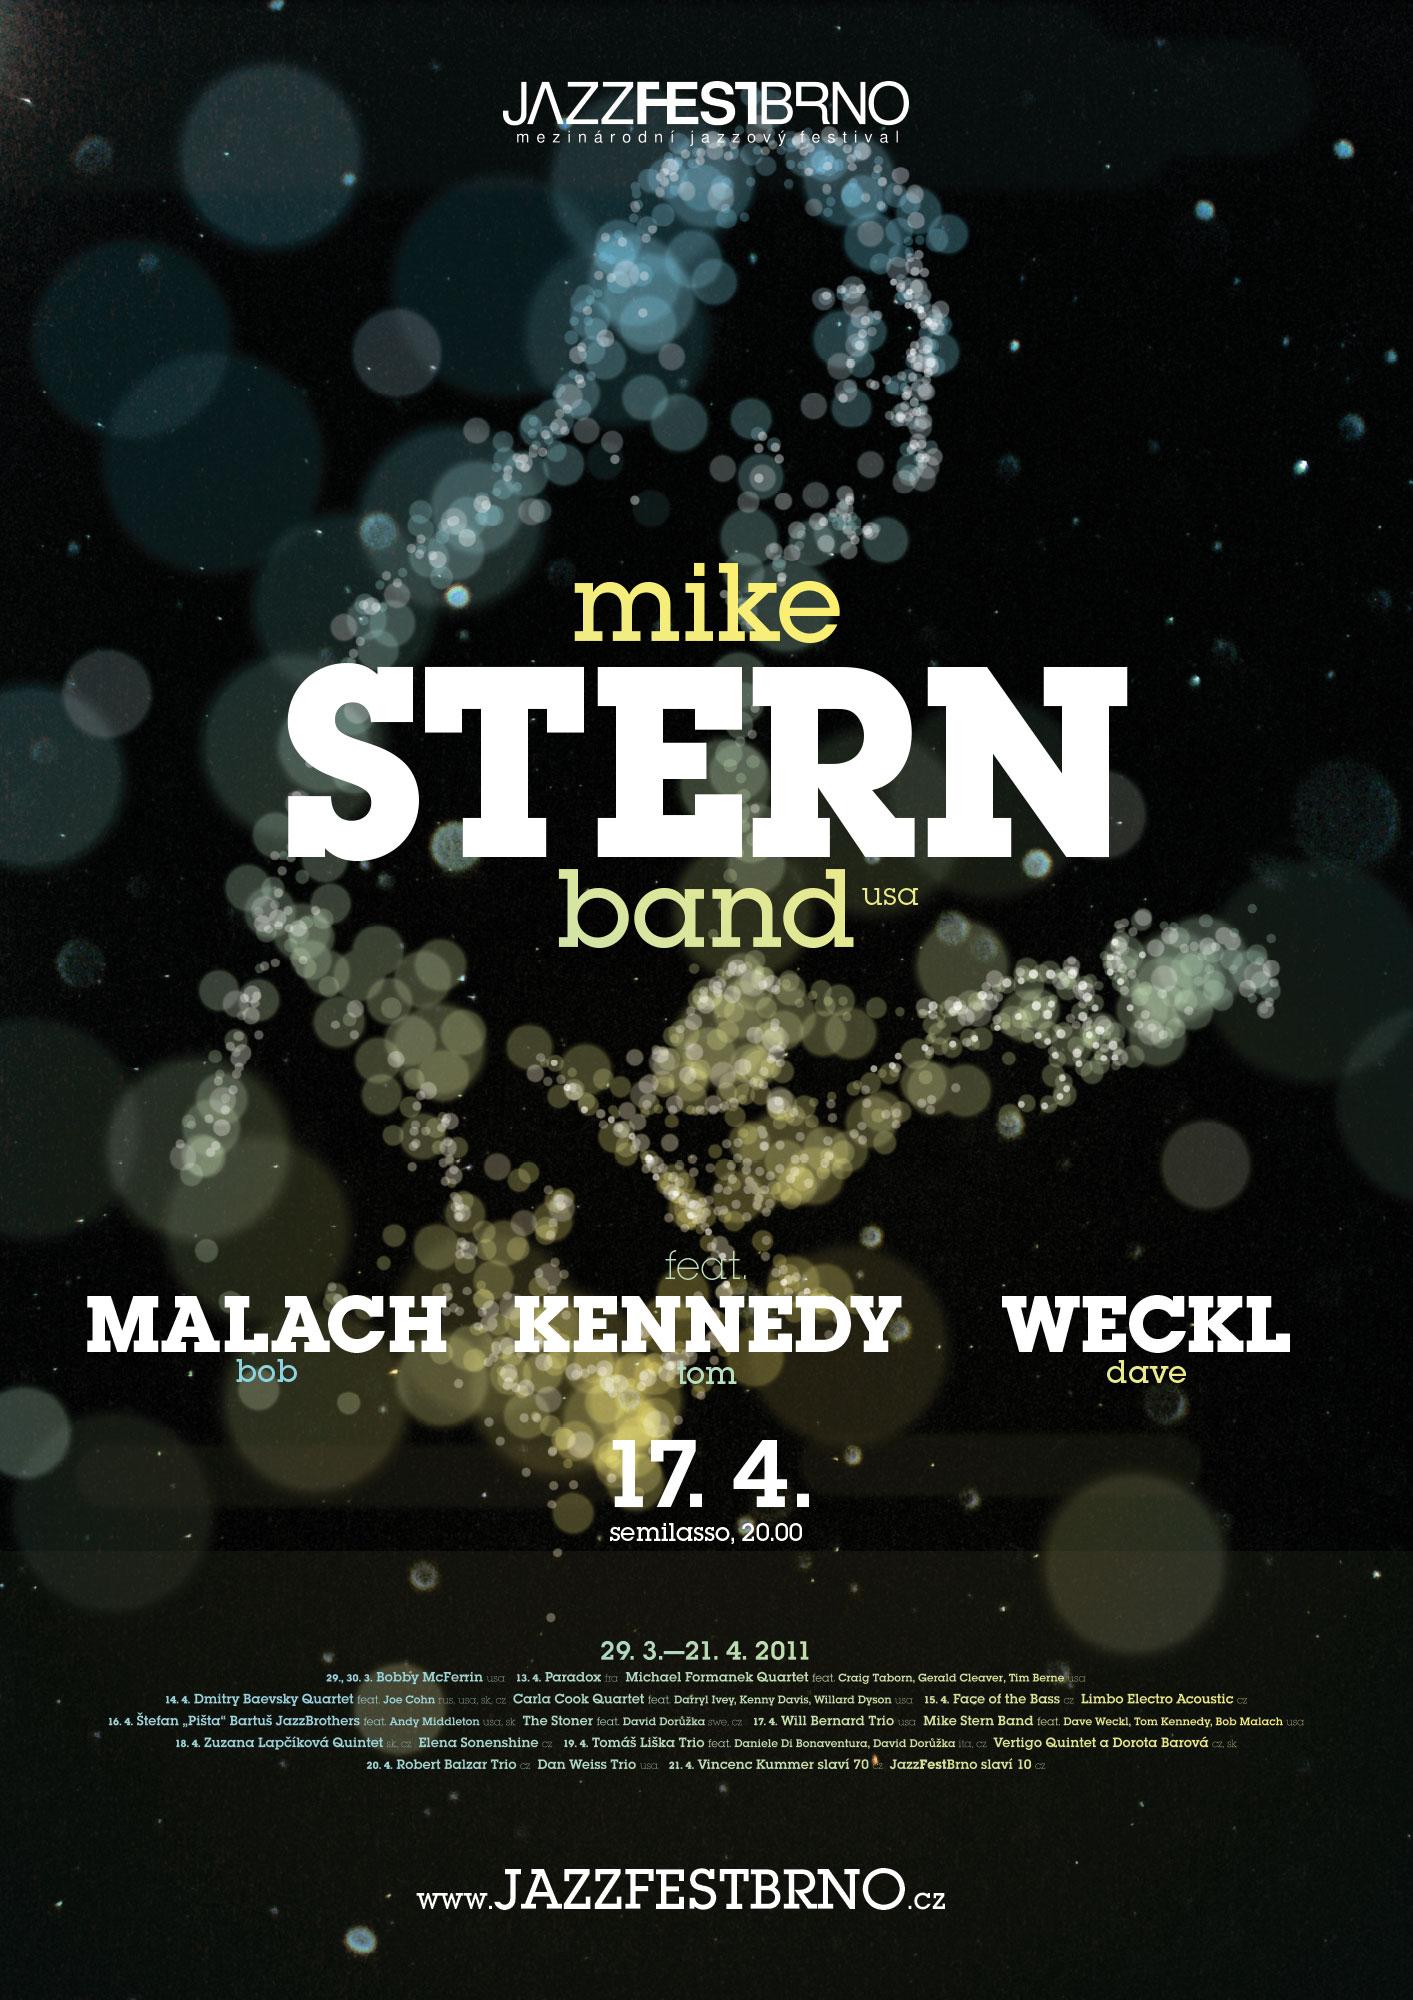 JazzFestBrno 2011 – Mike Stern